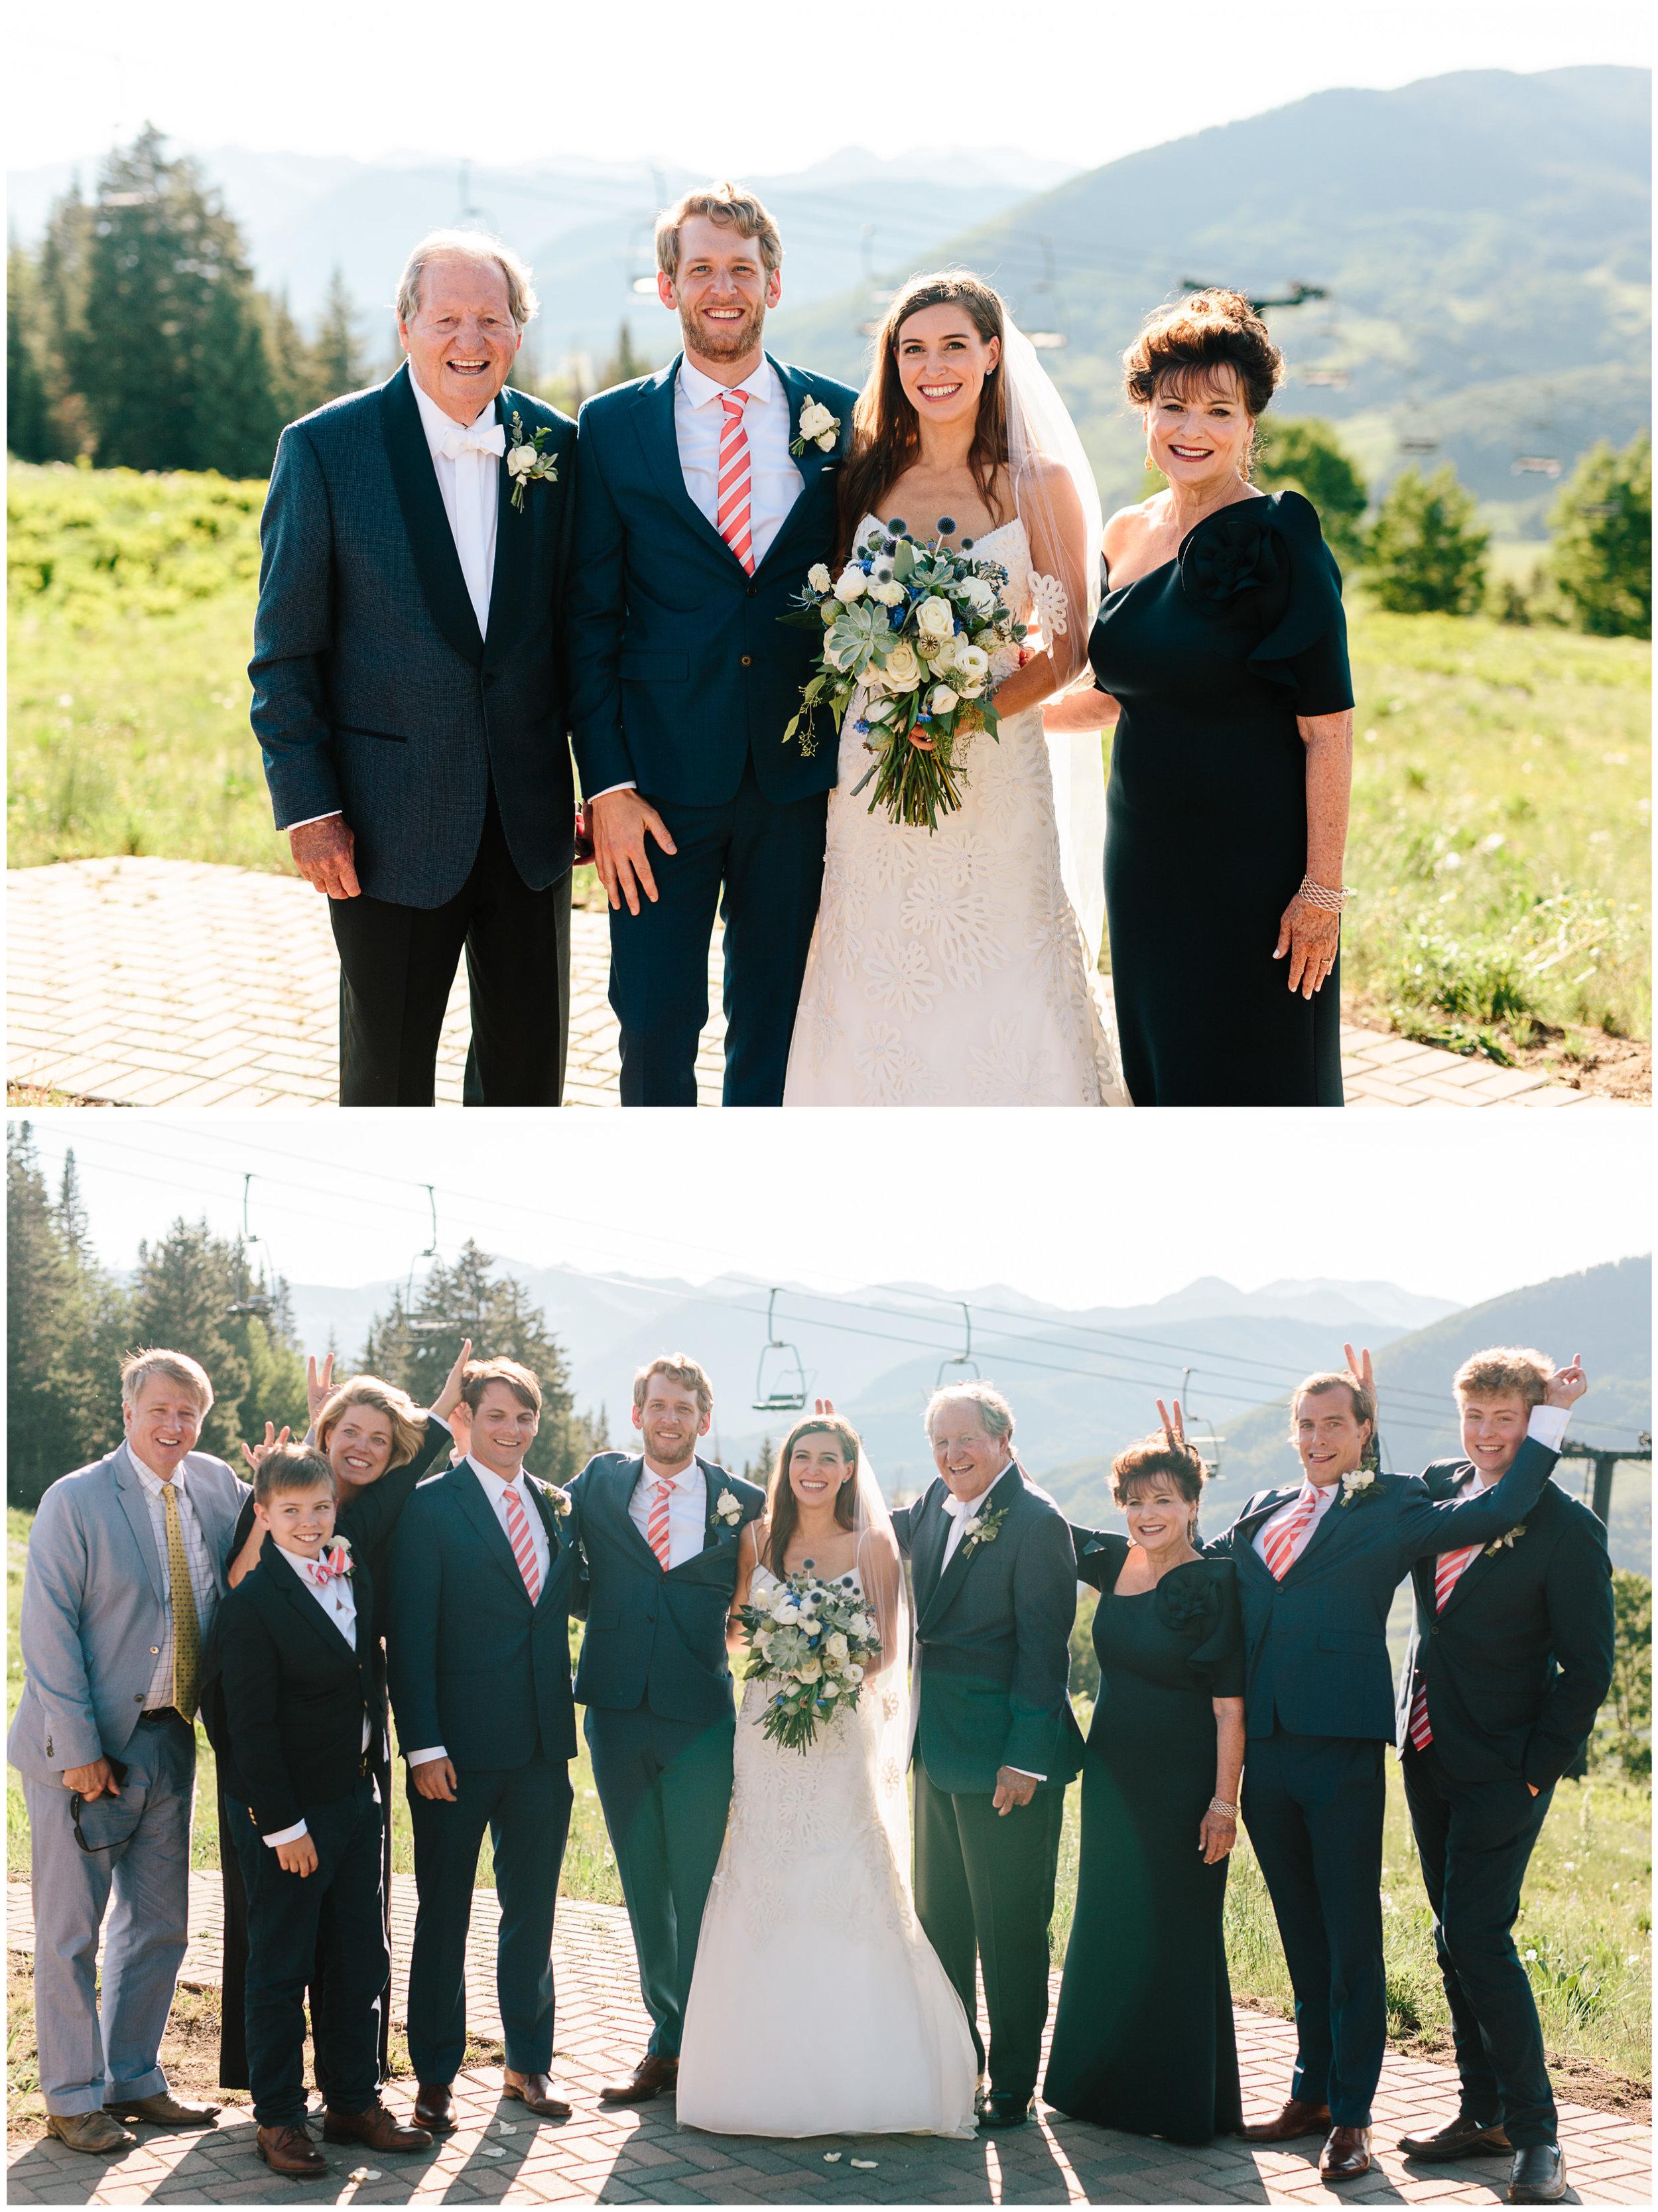 crested_butte_wedding_94.jpg